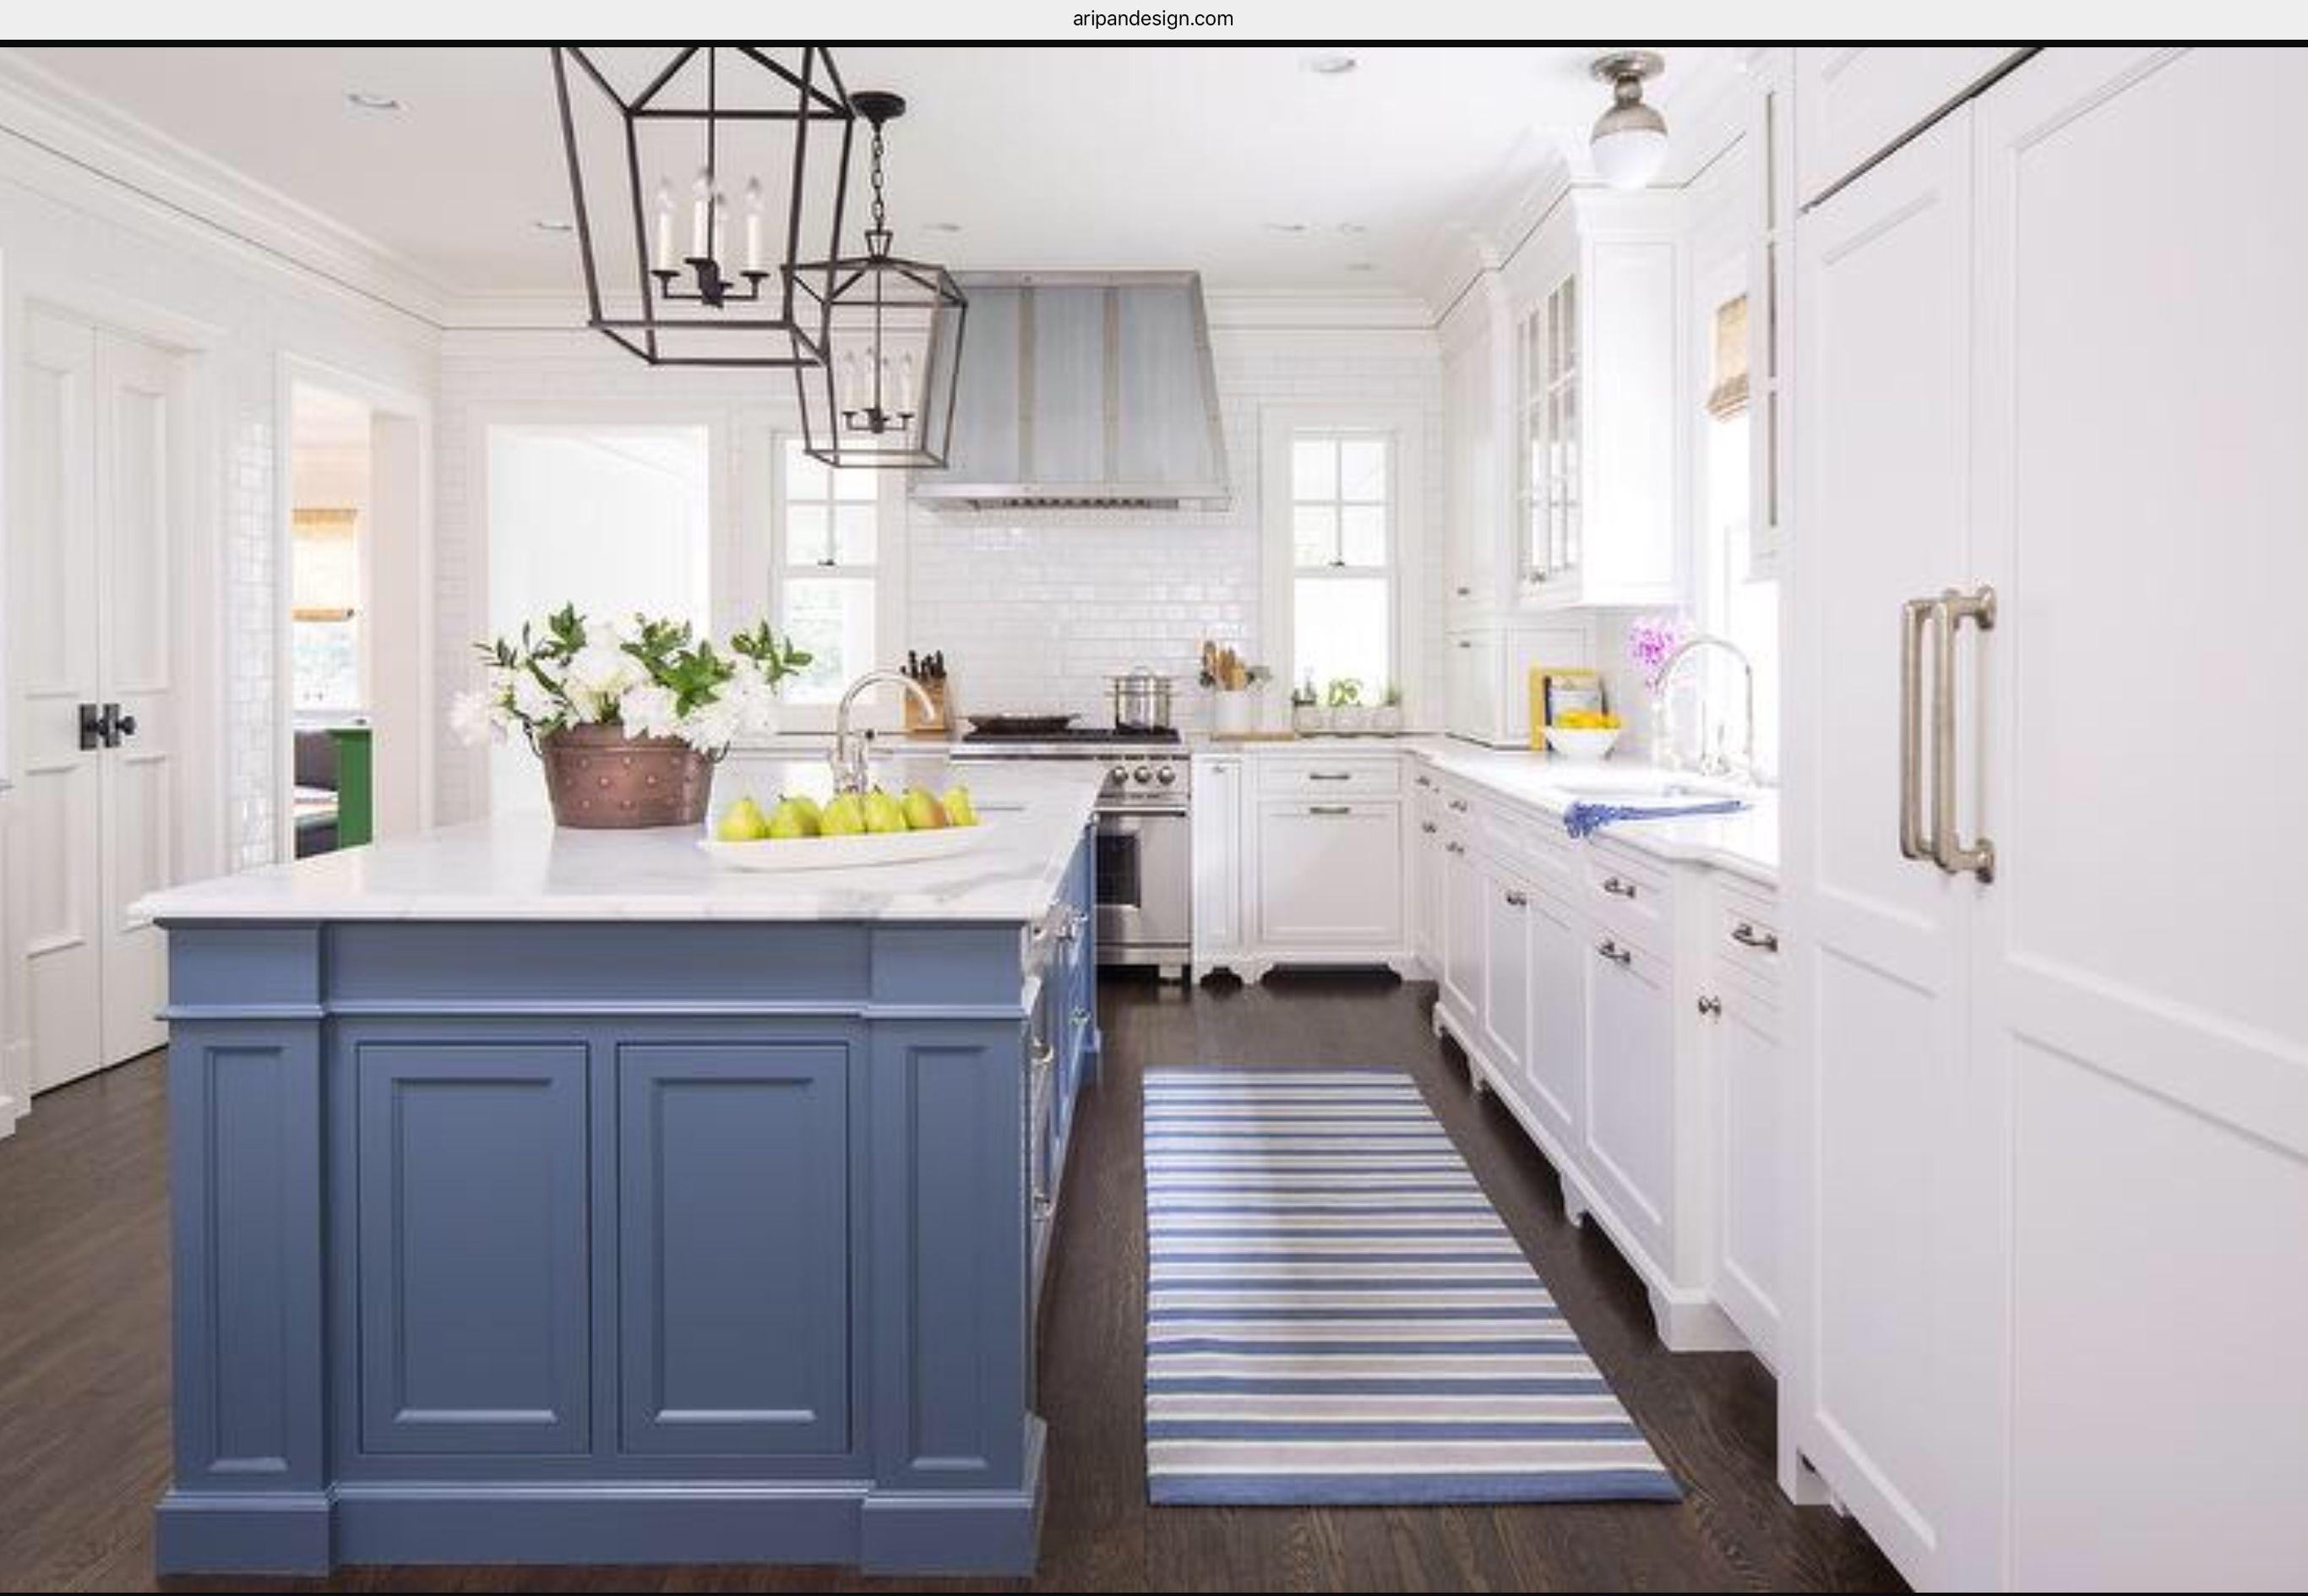 appliance garage 2018 hope s new ideas blue kitchen island van rh pinterest com